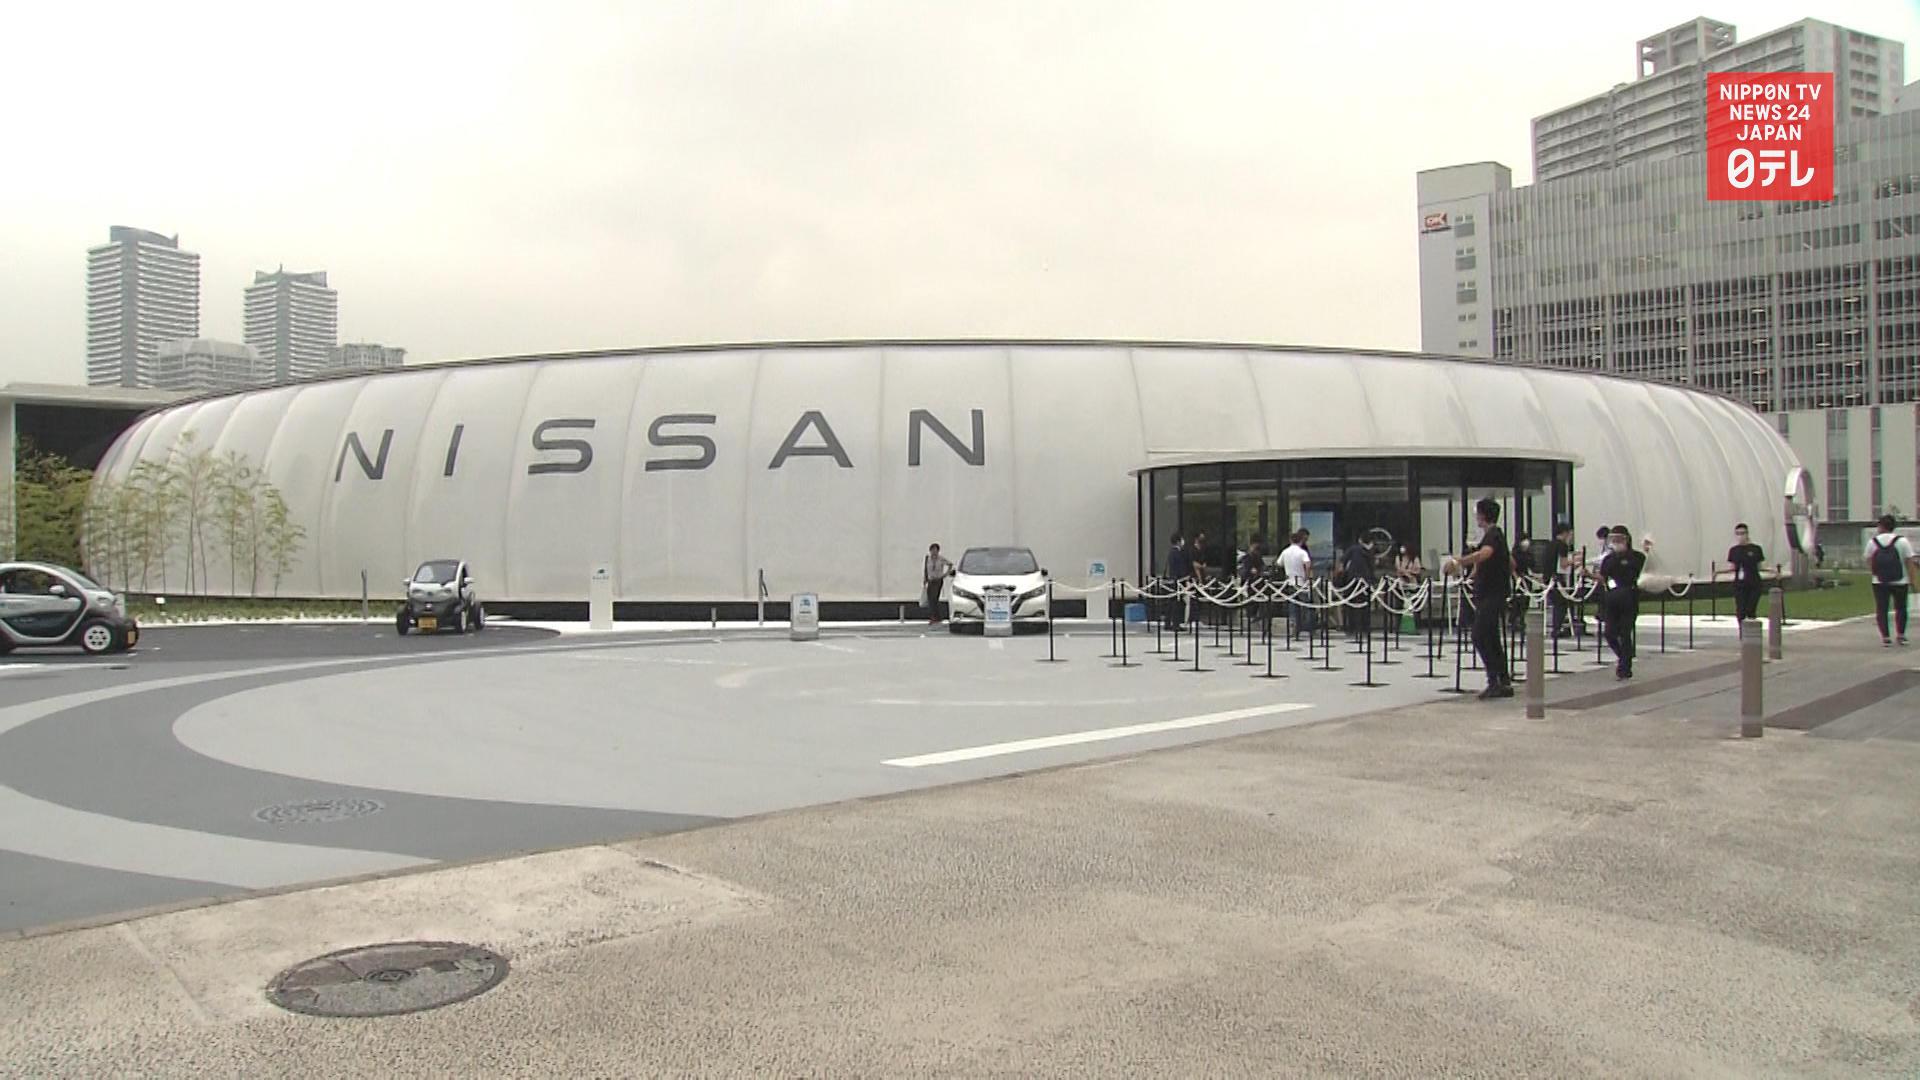 Nissan opens cutting-edge car pavilion in Yokohama